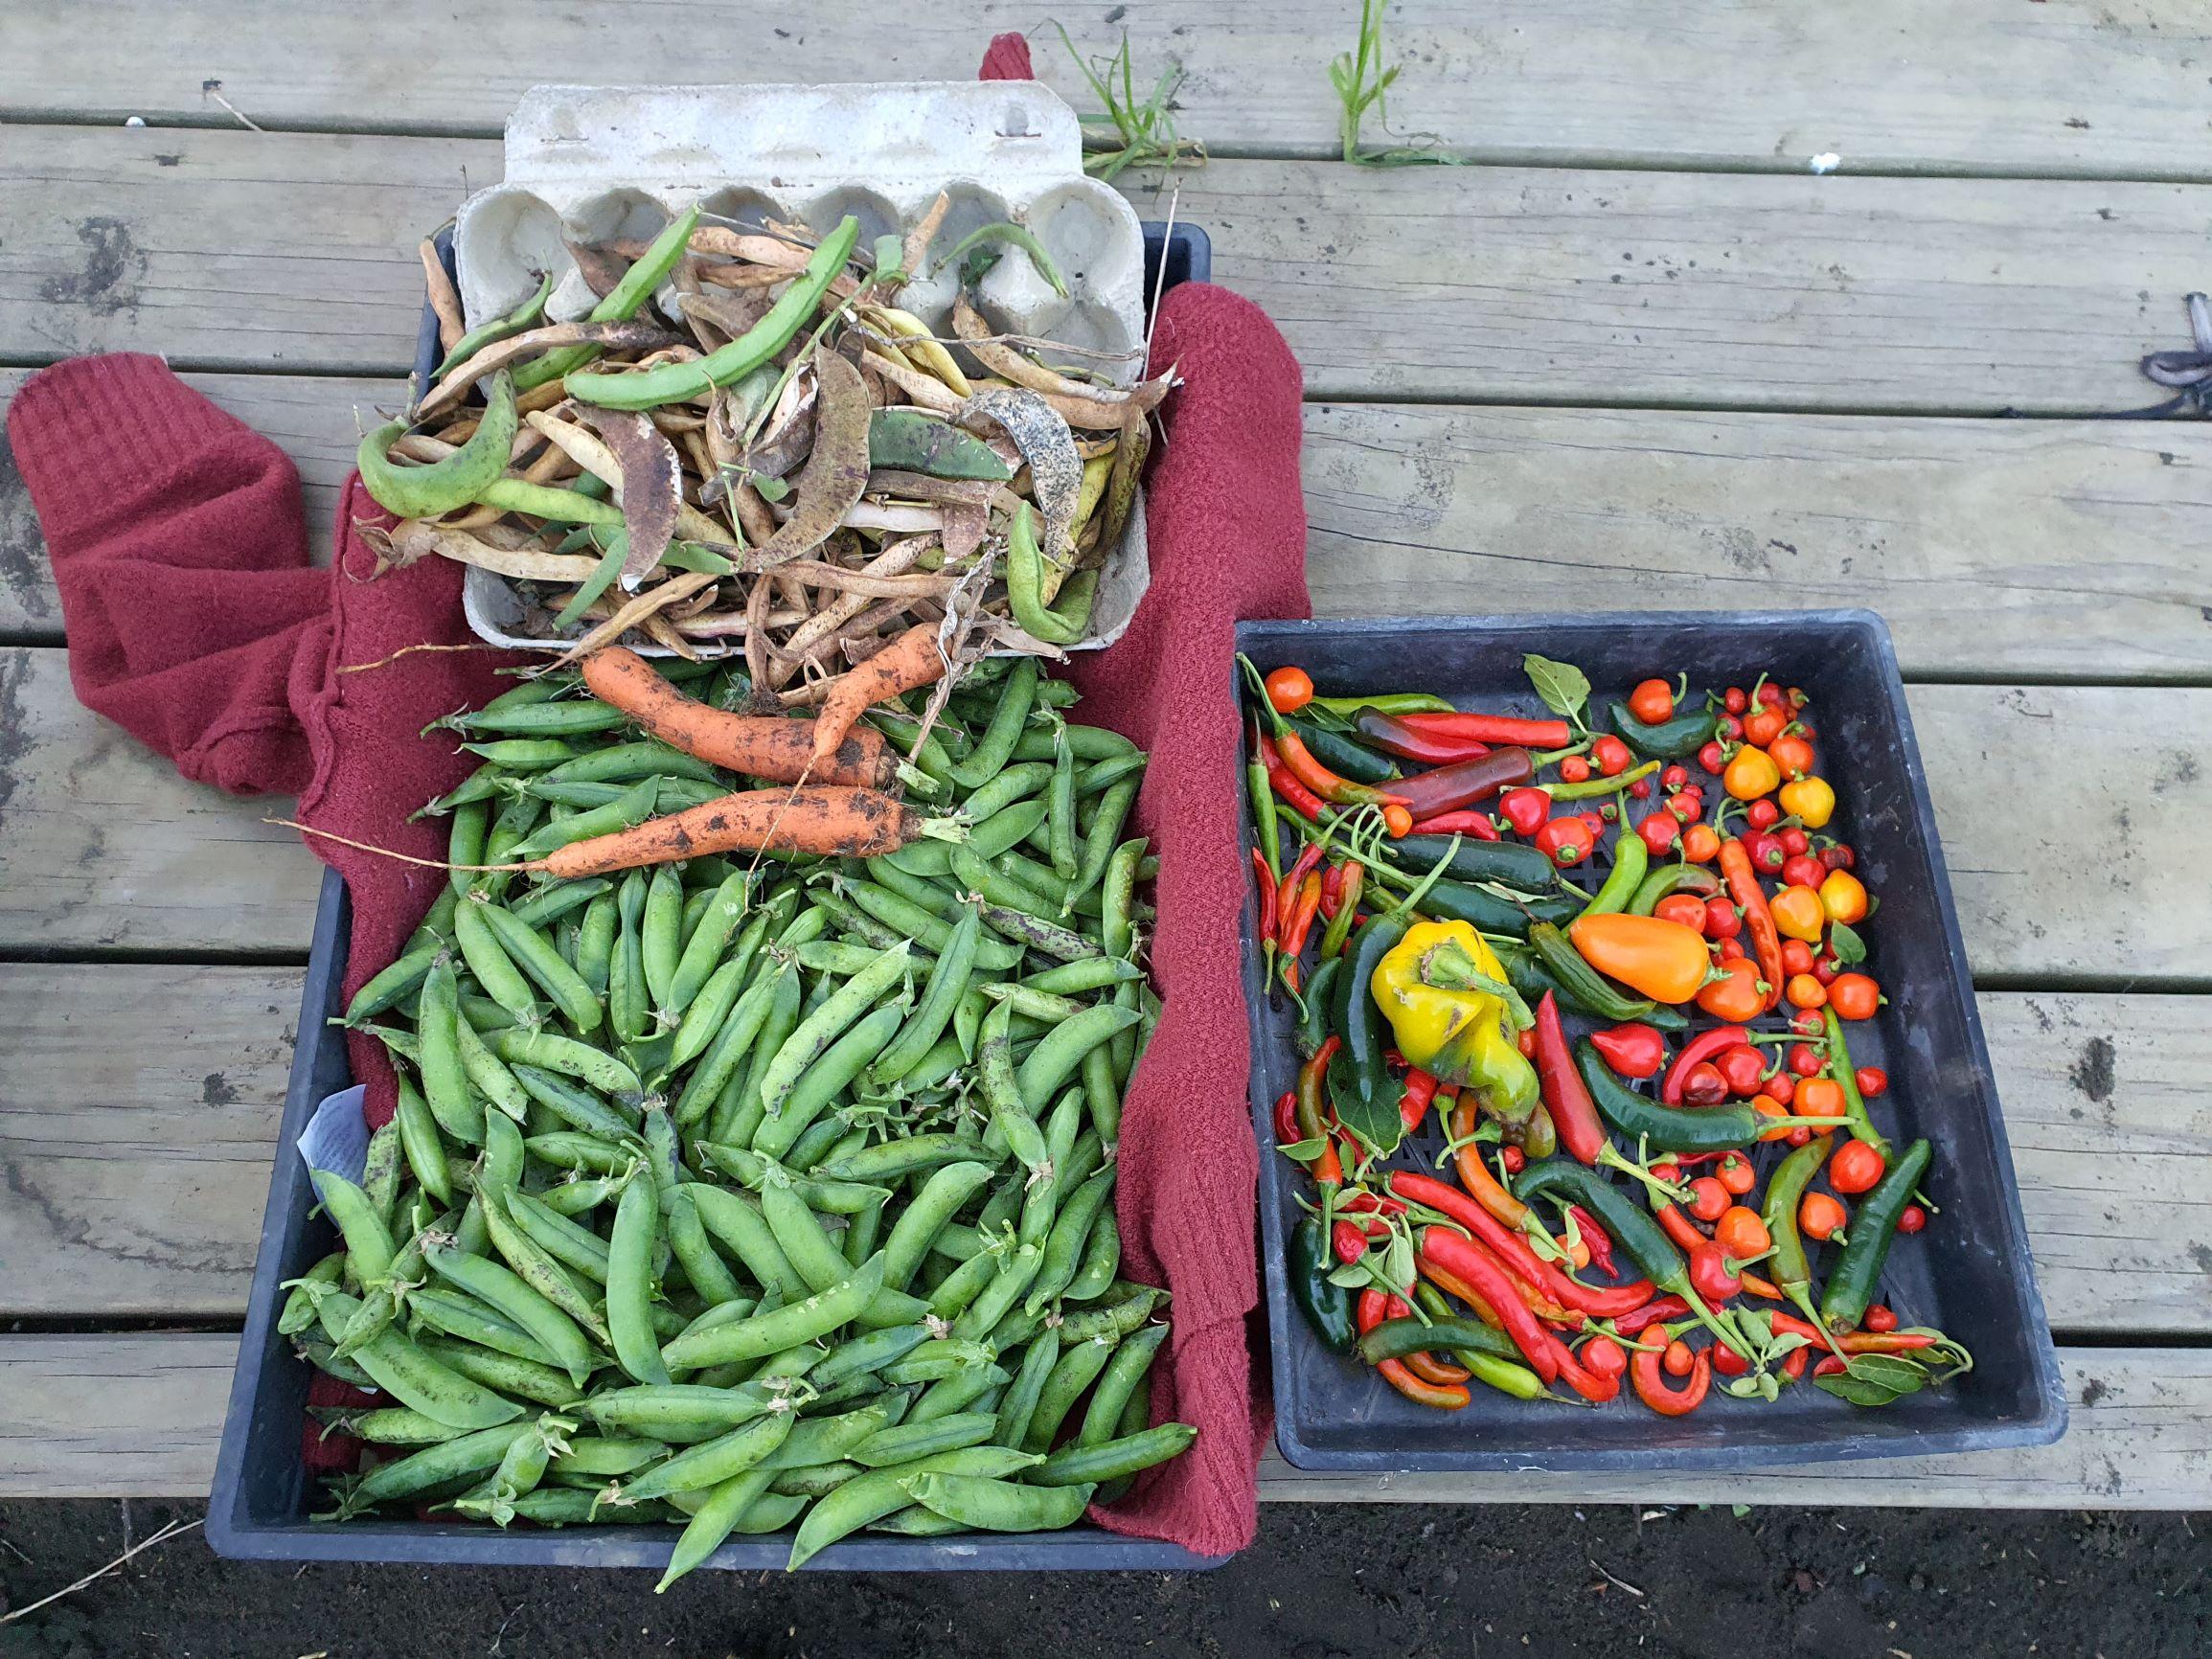 Late autumn to harvest